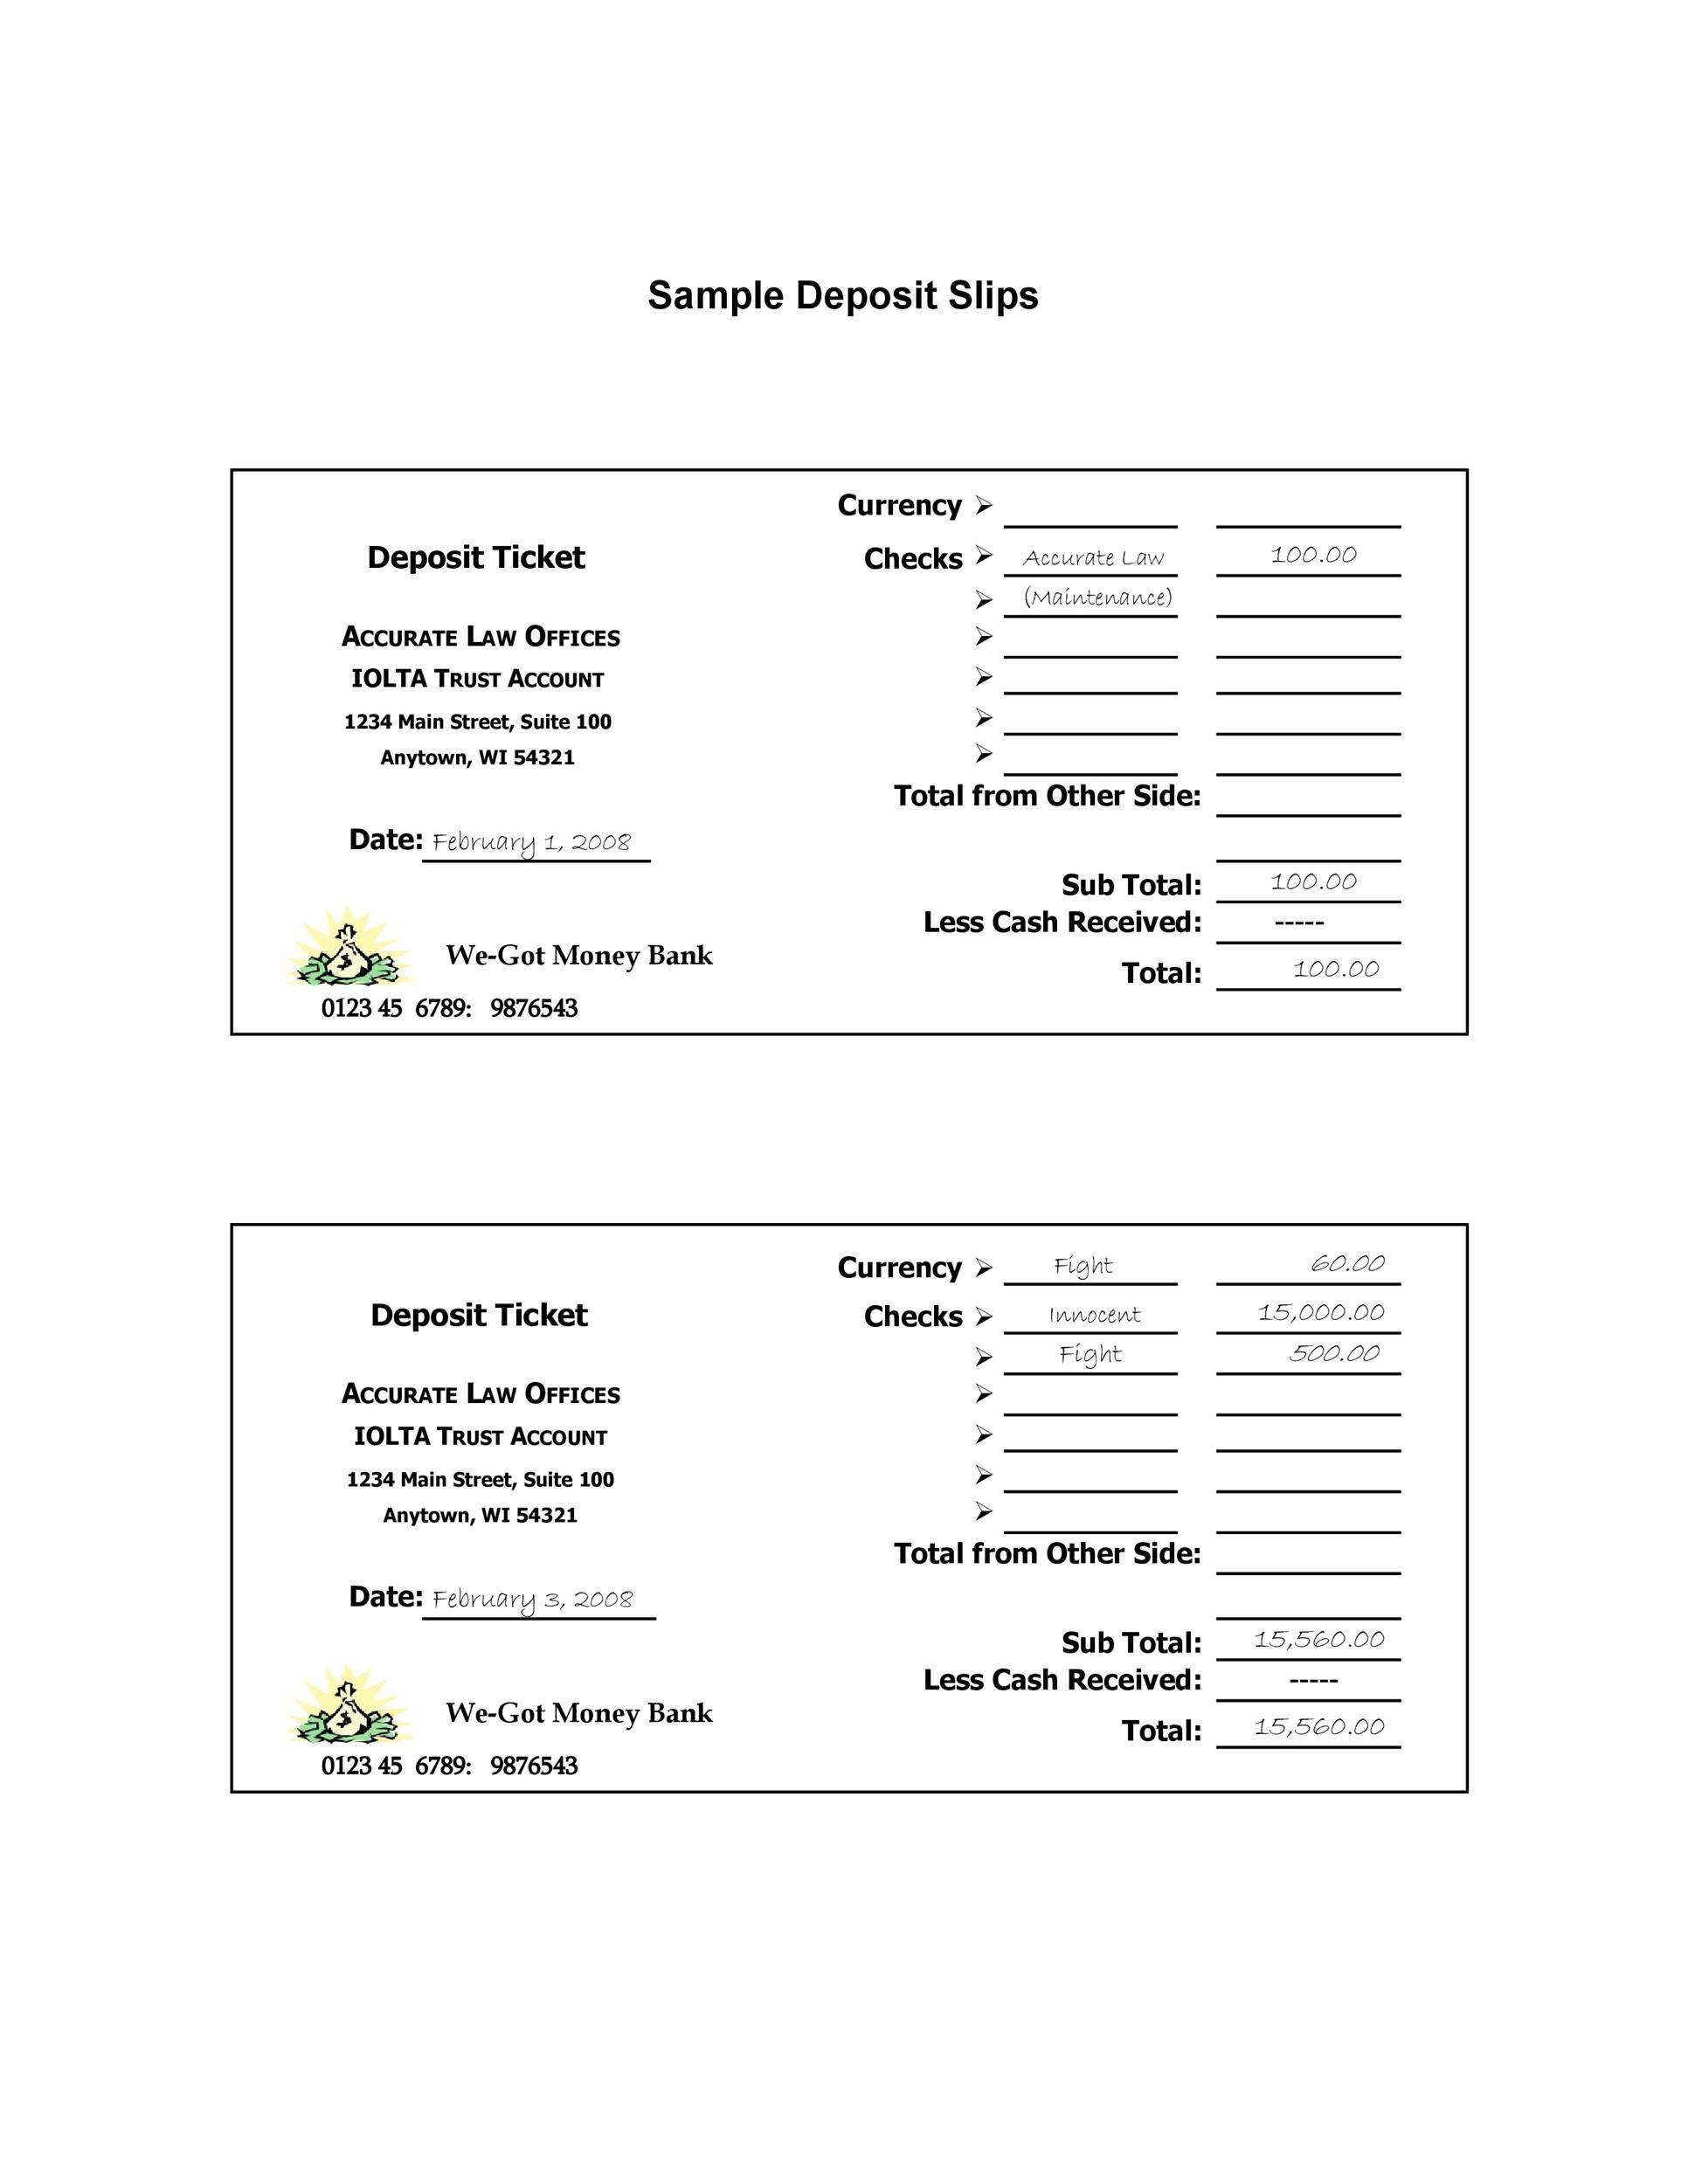 37 Bank Deposit Slip Templates & Examples ᐅ TemplateLab